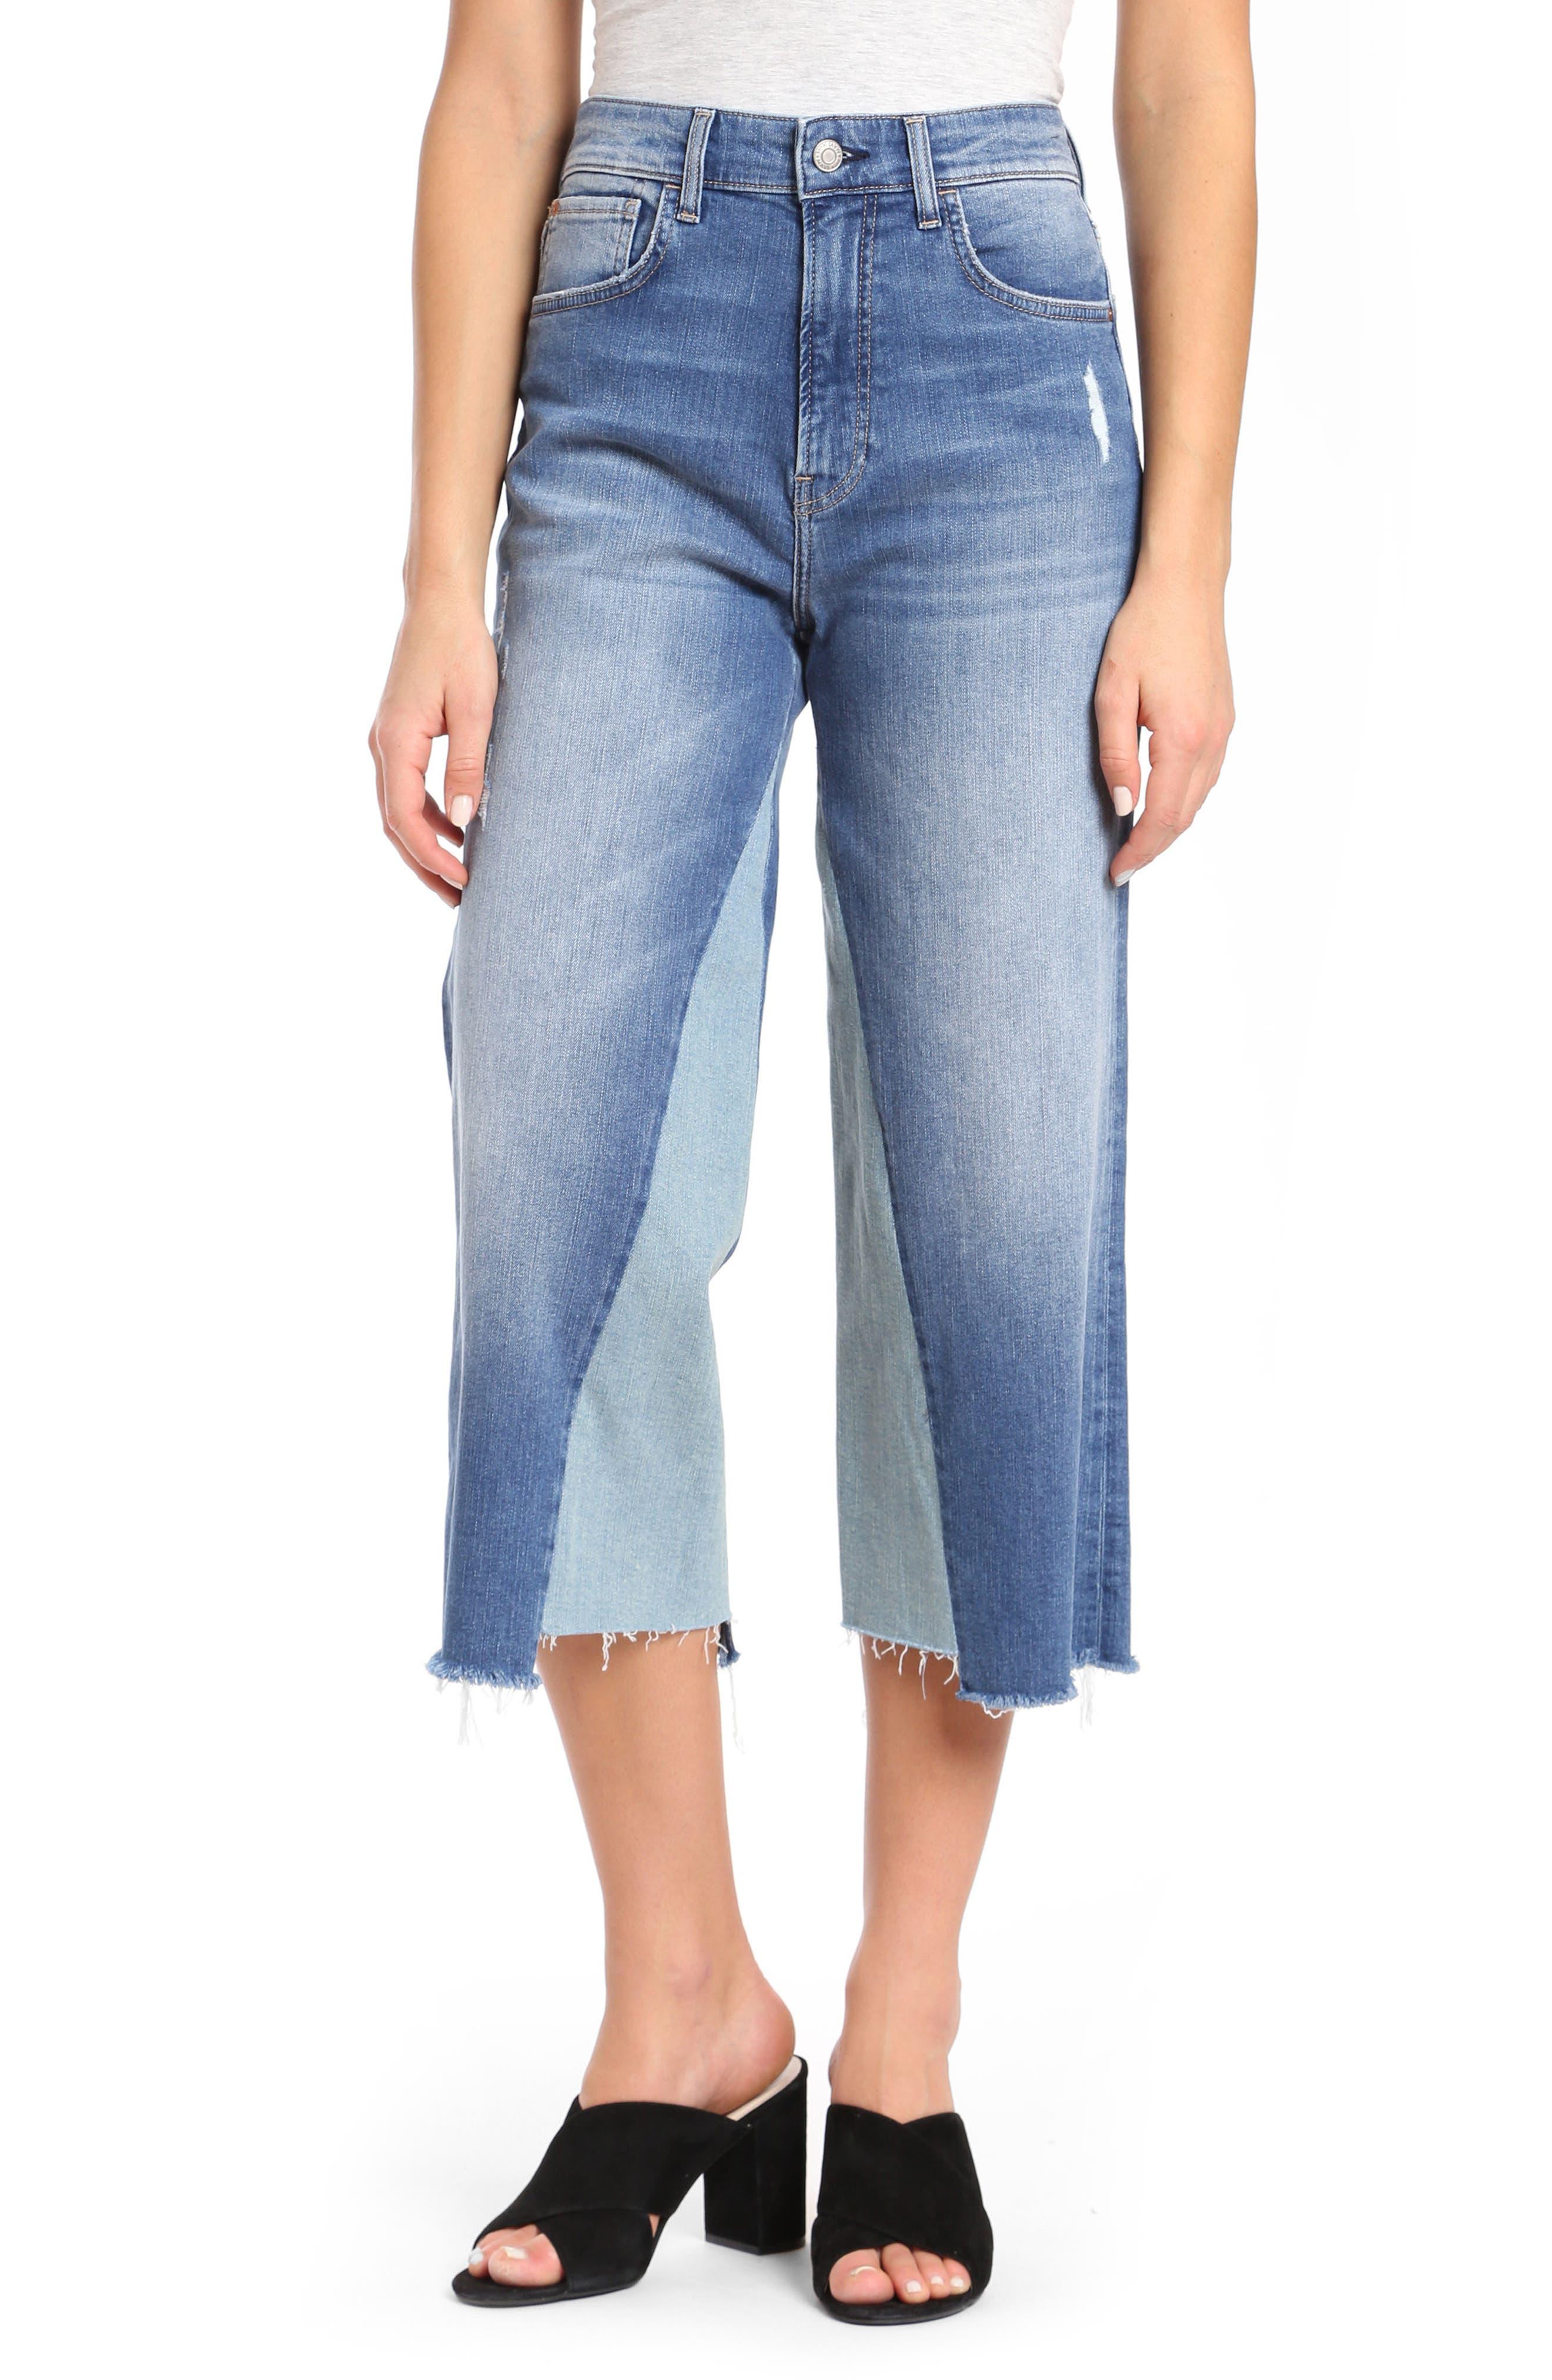 Elliott Wide Leg Contrast Jeans,                         Main,                         color, Mid Shadow